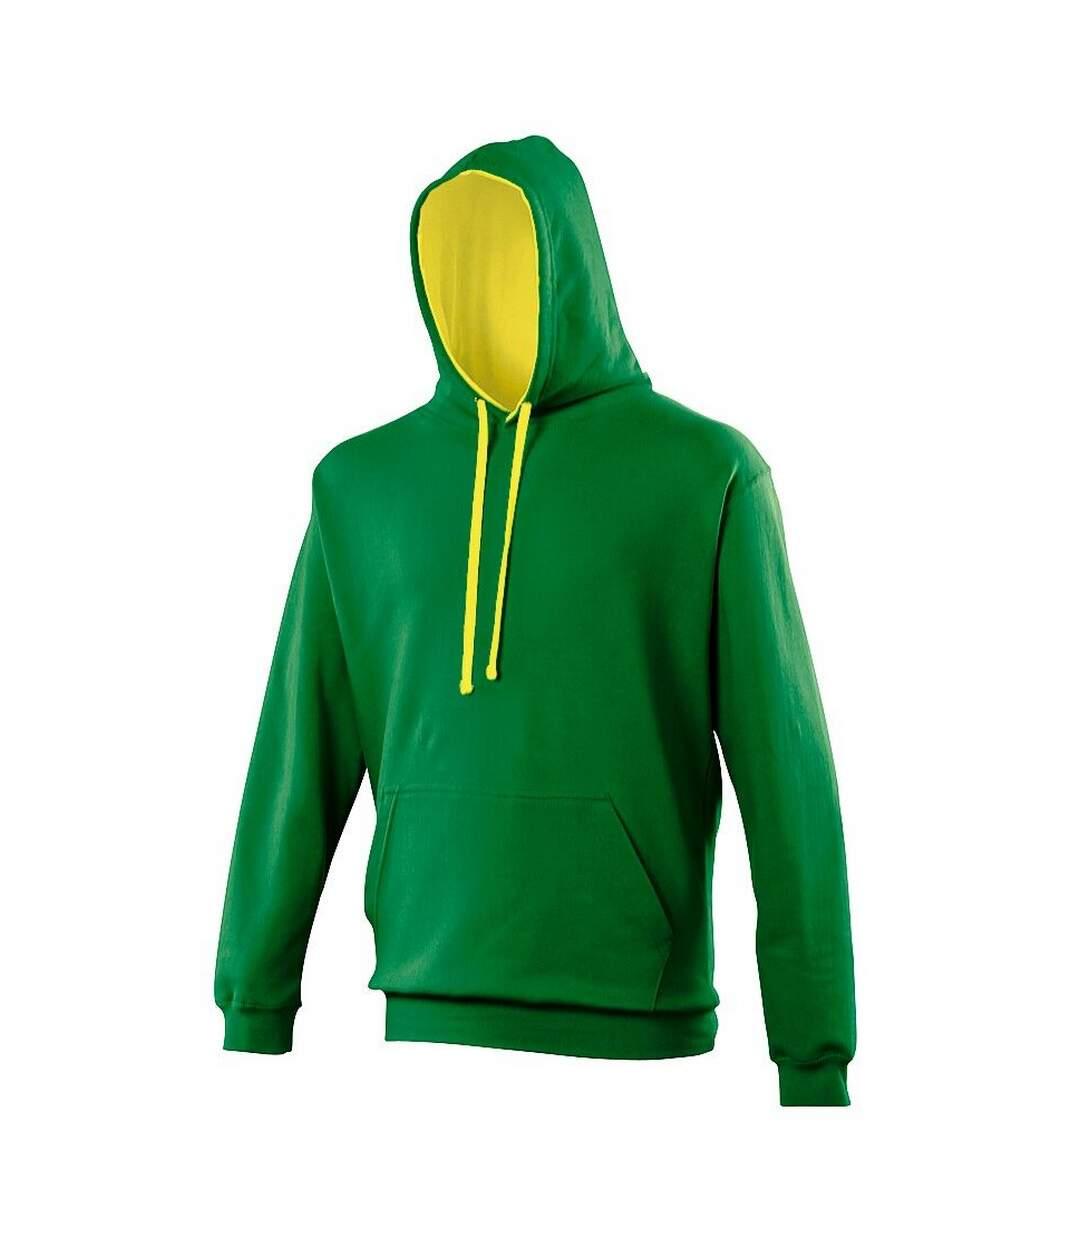 Awdis Varsity Hooded Sweatshirt / Hoodie (Kelly Green / Sun Yellow) - UTRW165